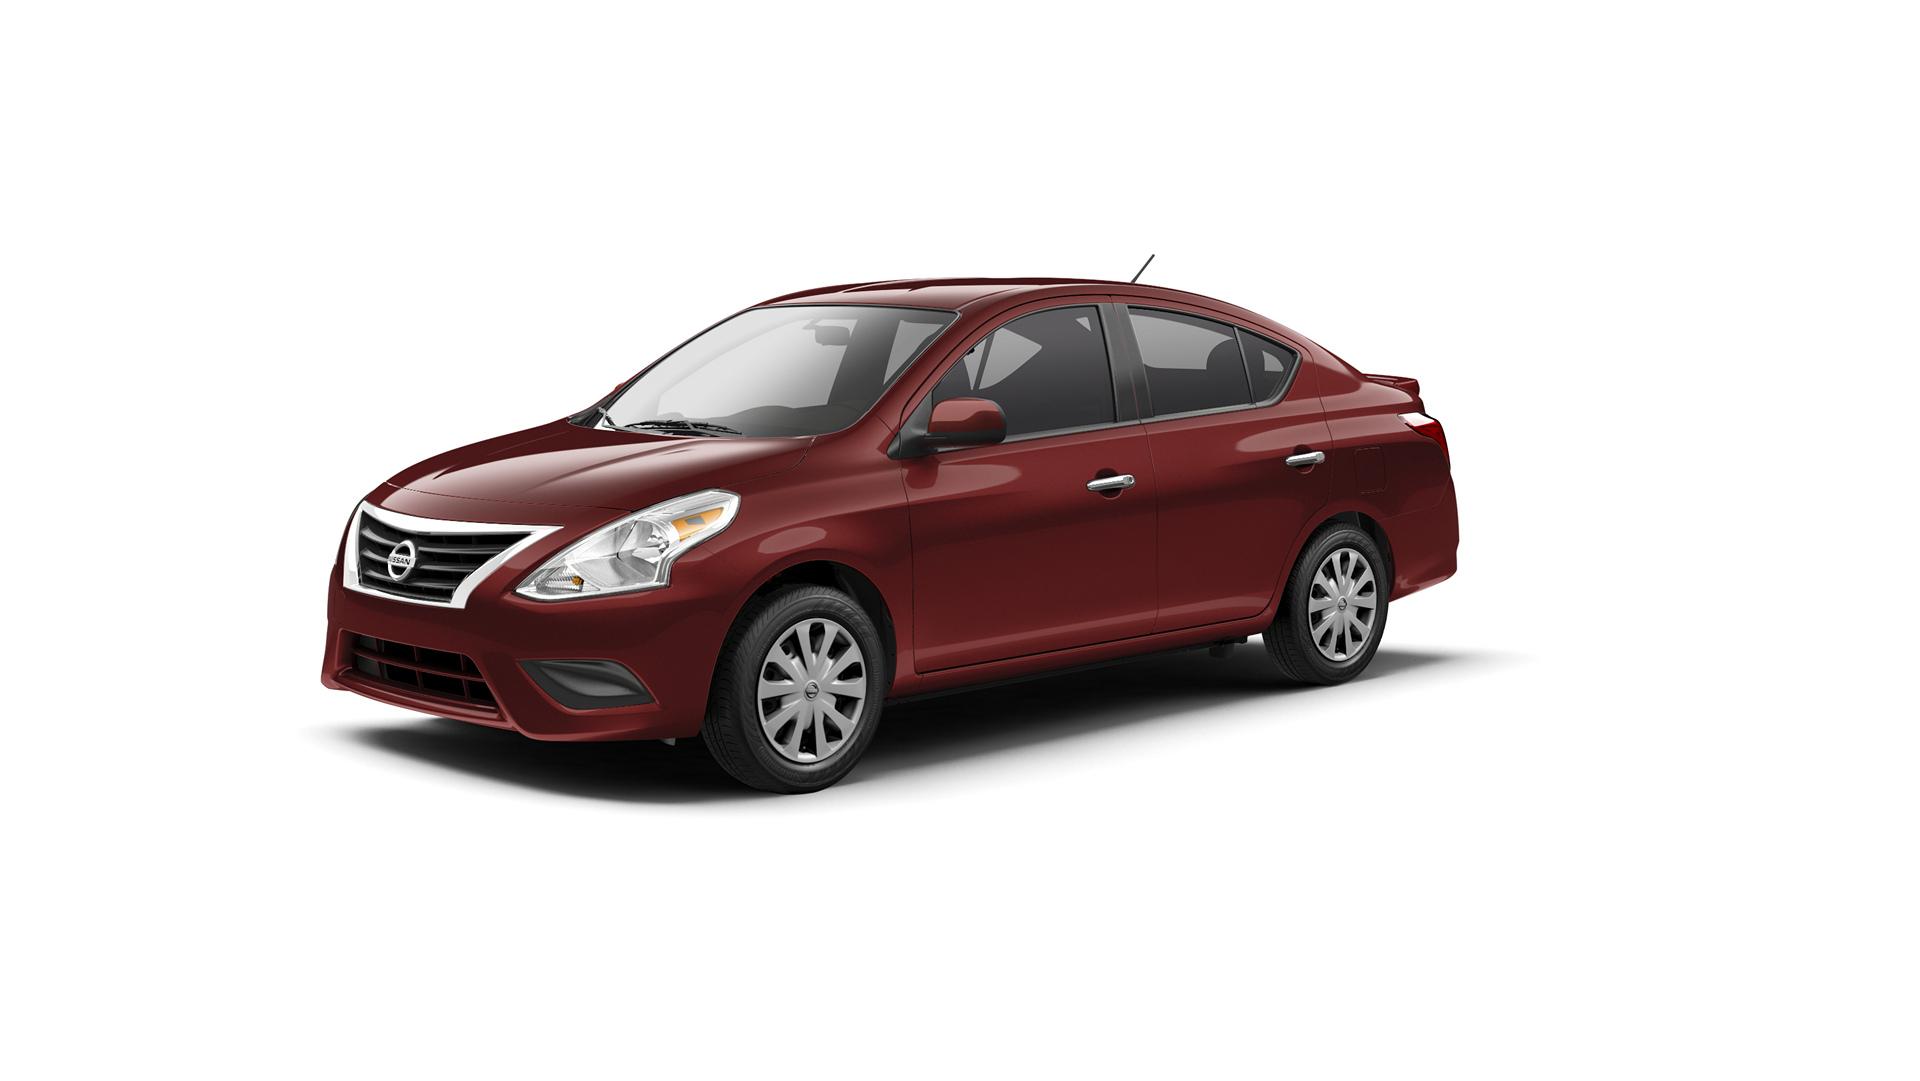 2017 Nissan Versa Sedan © Nissan Motor Co., Ltd.